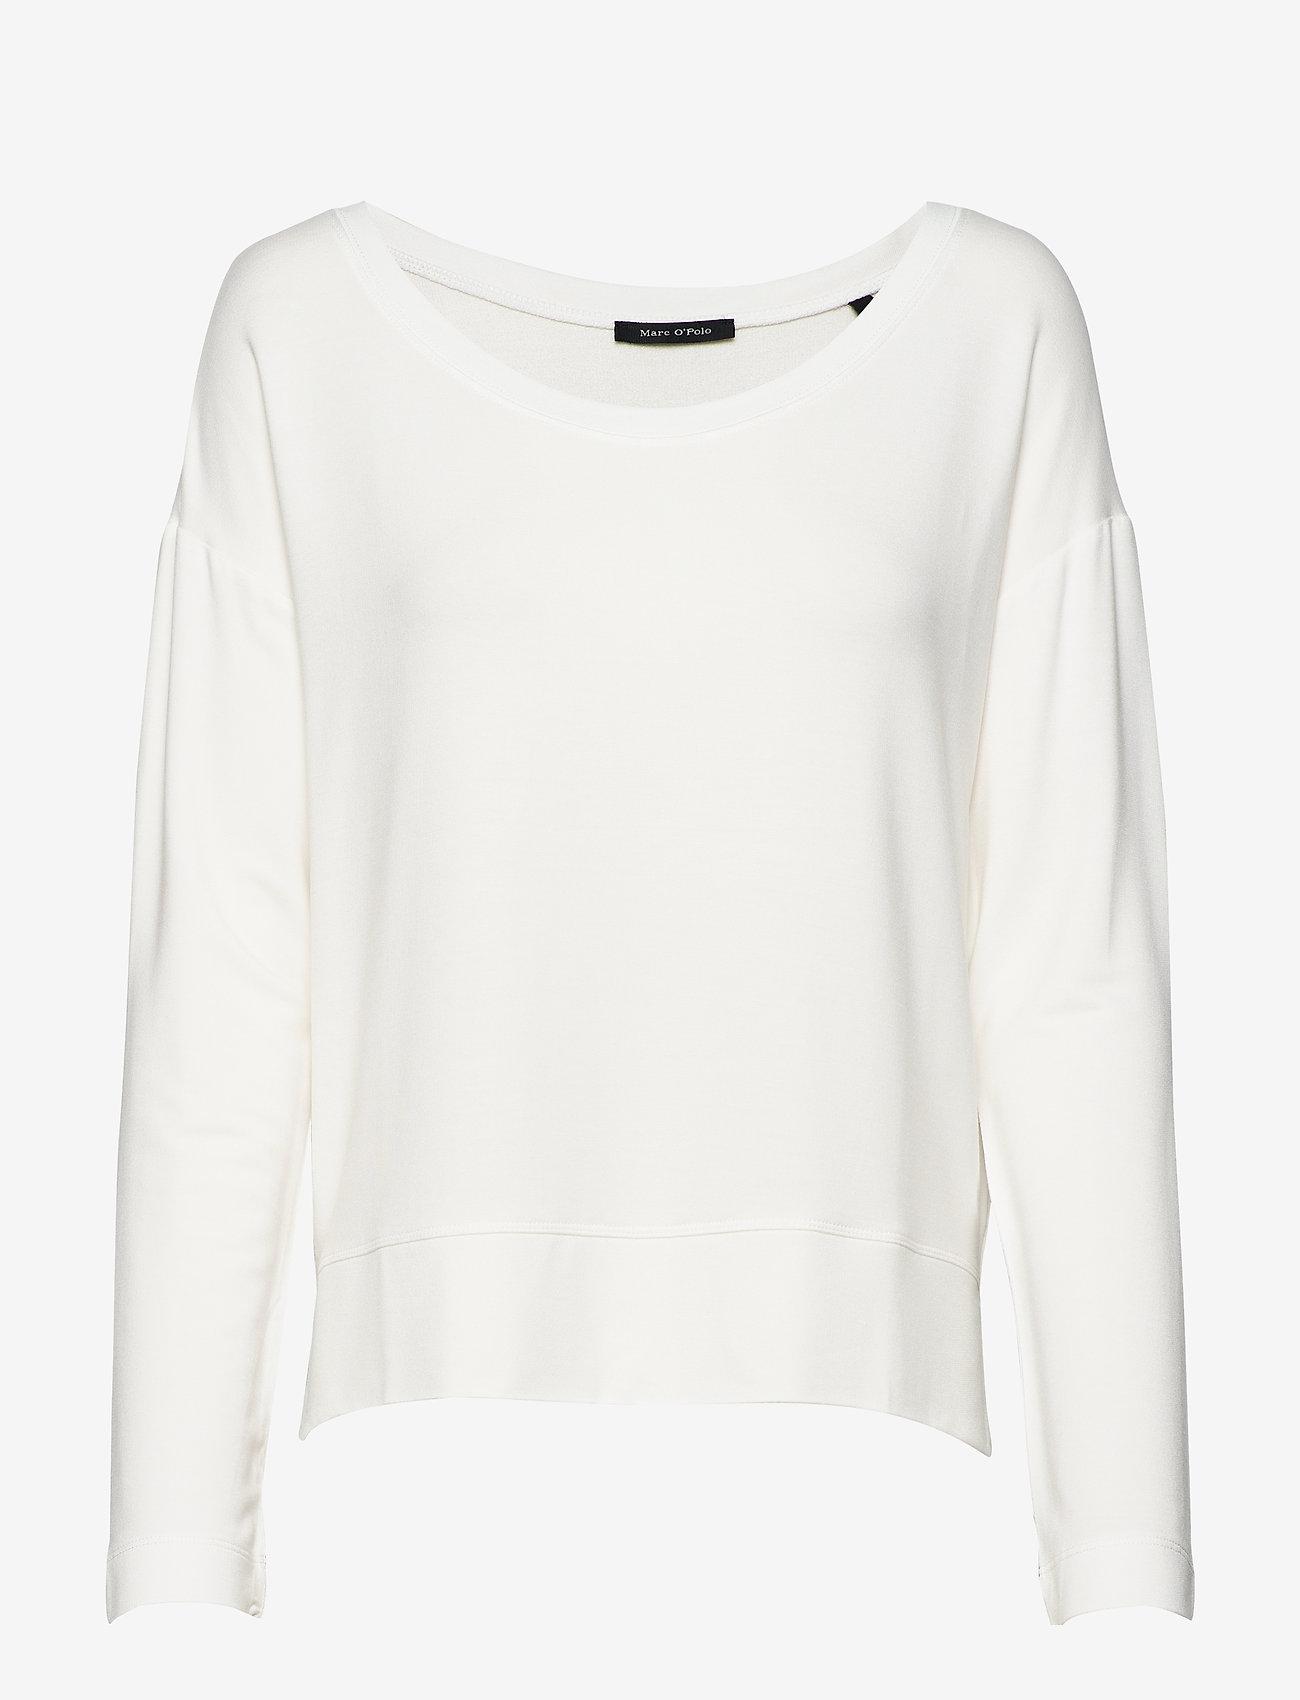 Marc O'Polo - SWEATSHIRTS - sweatshirts - oyster white - 0